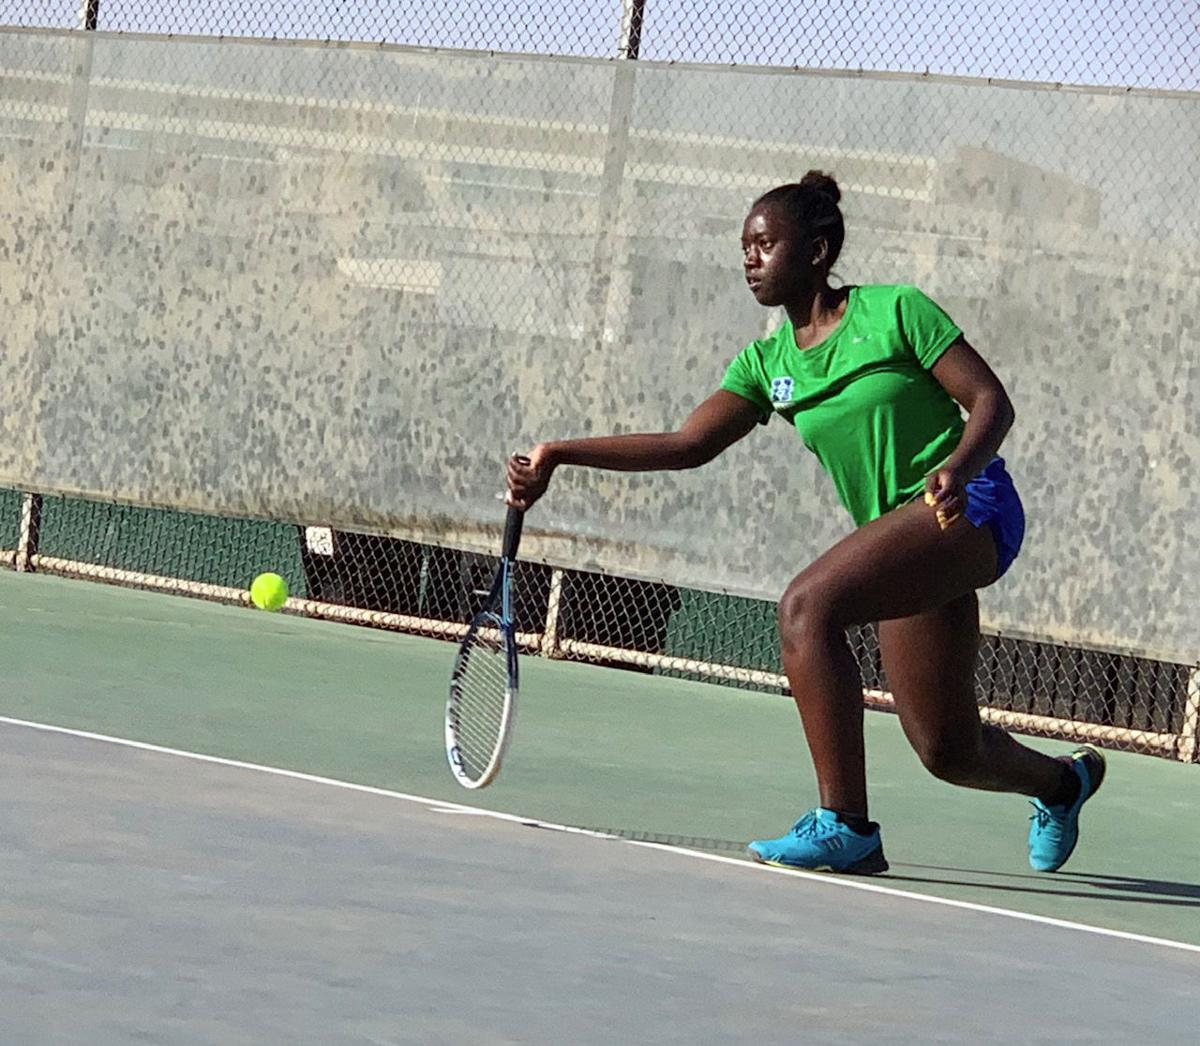 tennis 1769